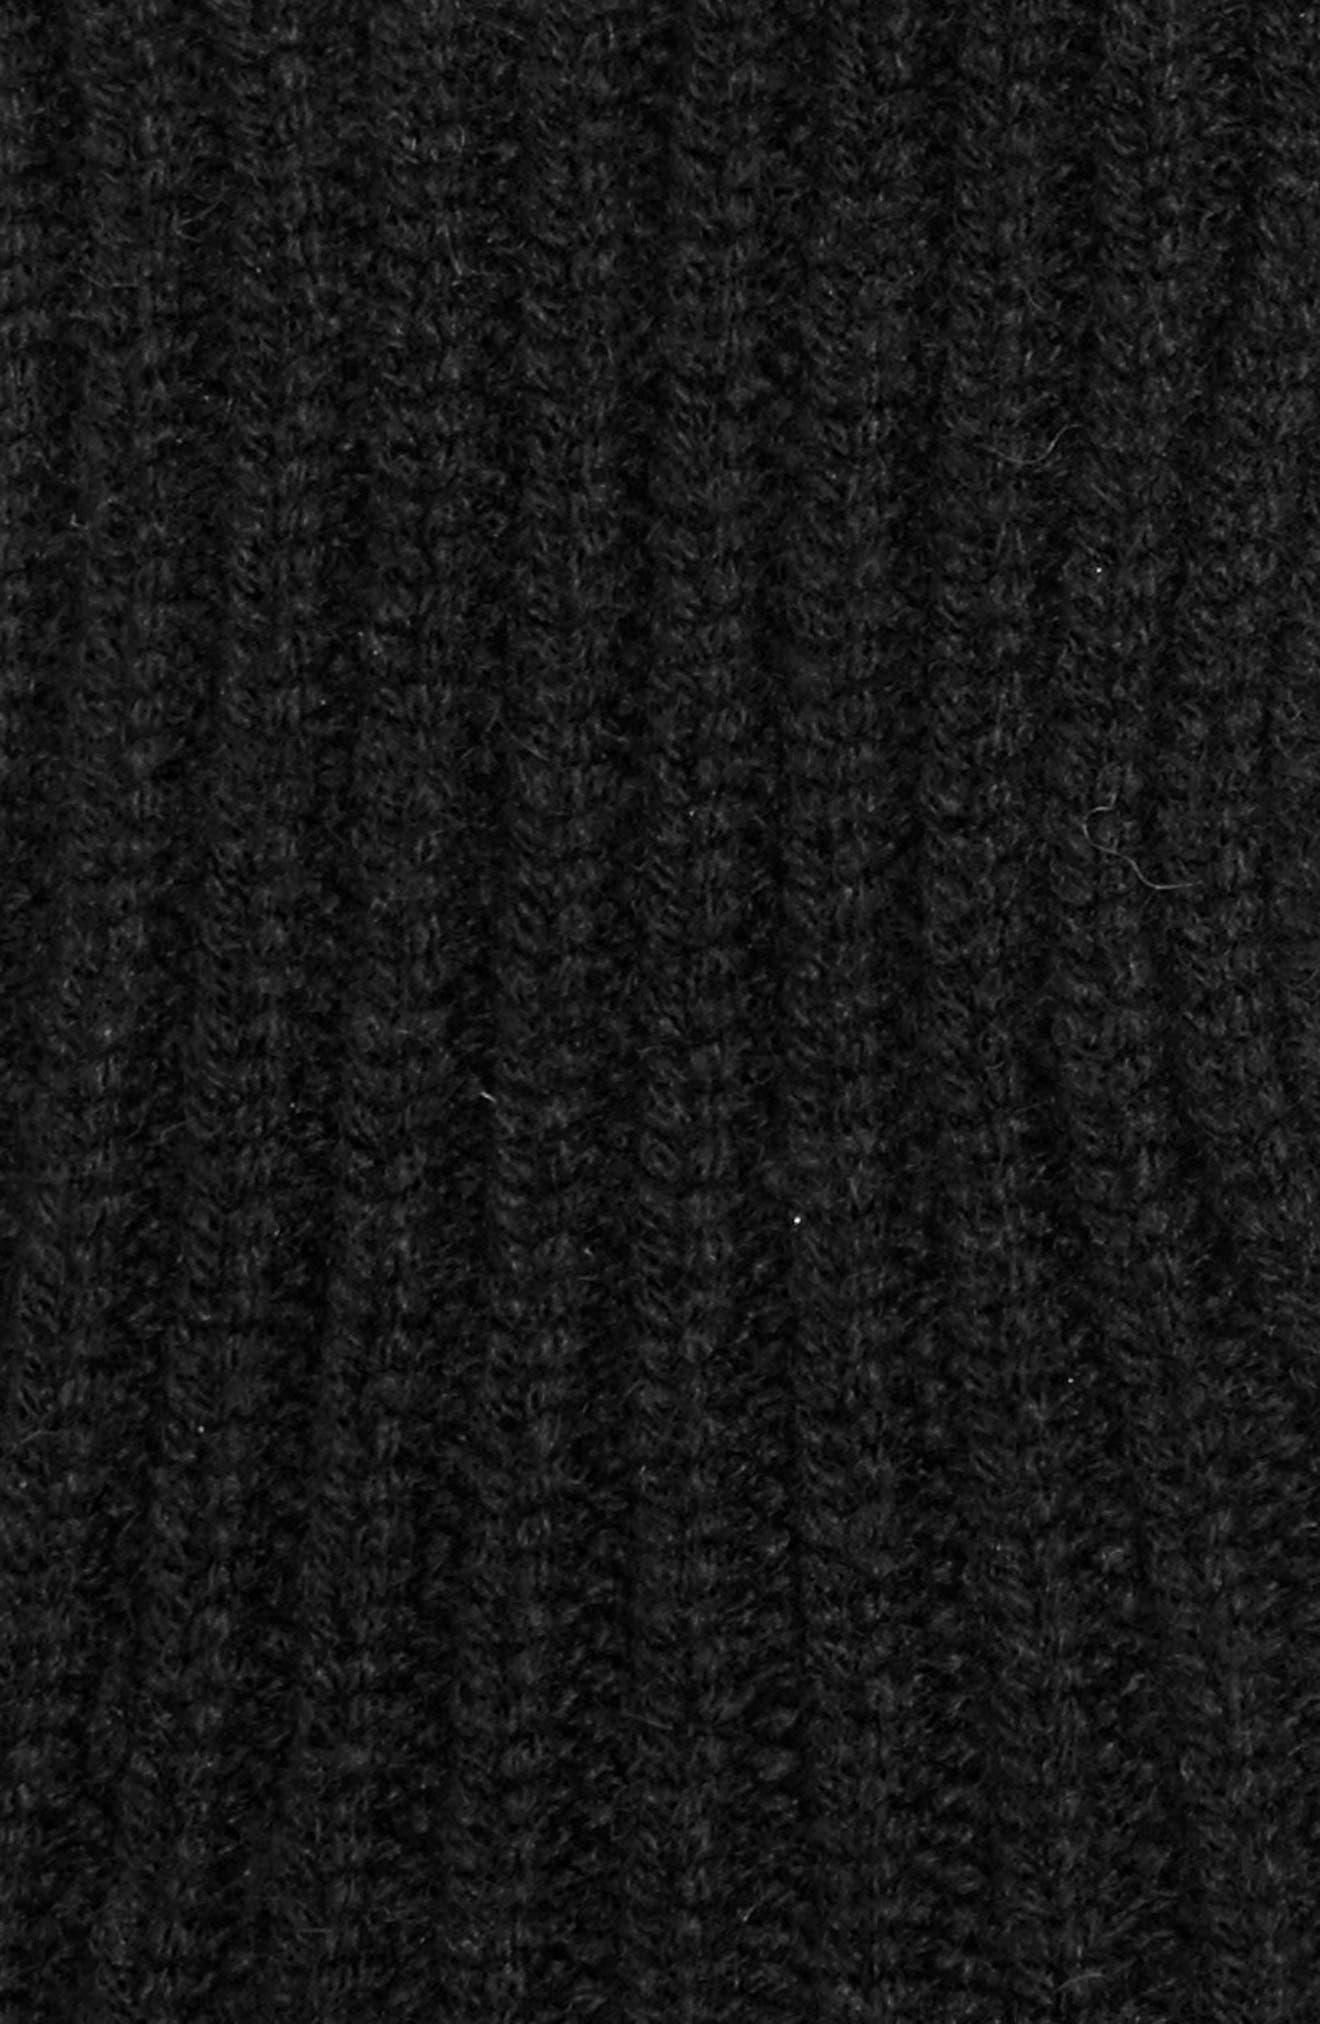 Guanti Wool & Cashmere Long Fingerless Gloves,                             Alternate thumbnail 3, color,                             001